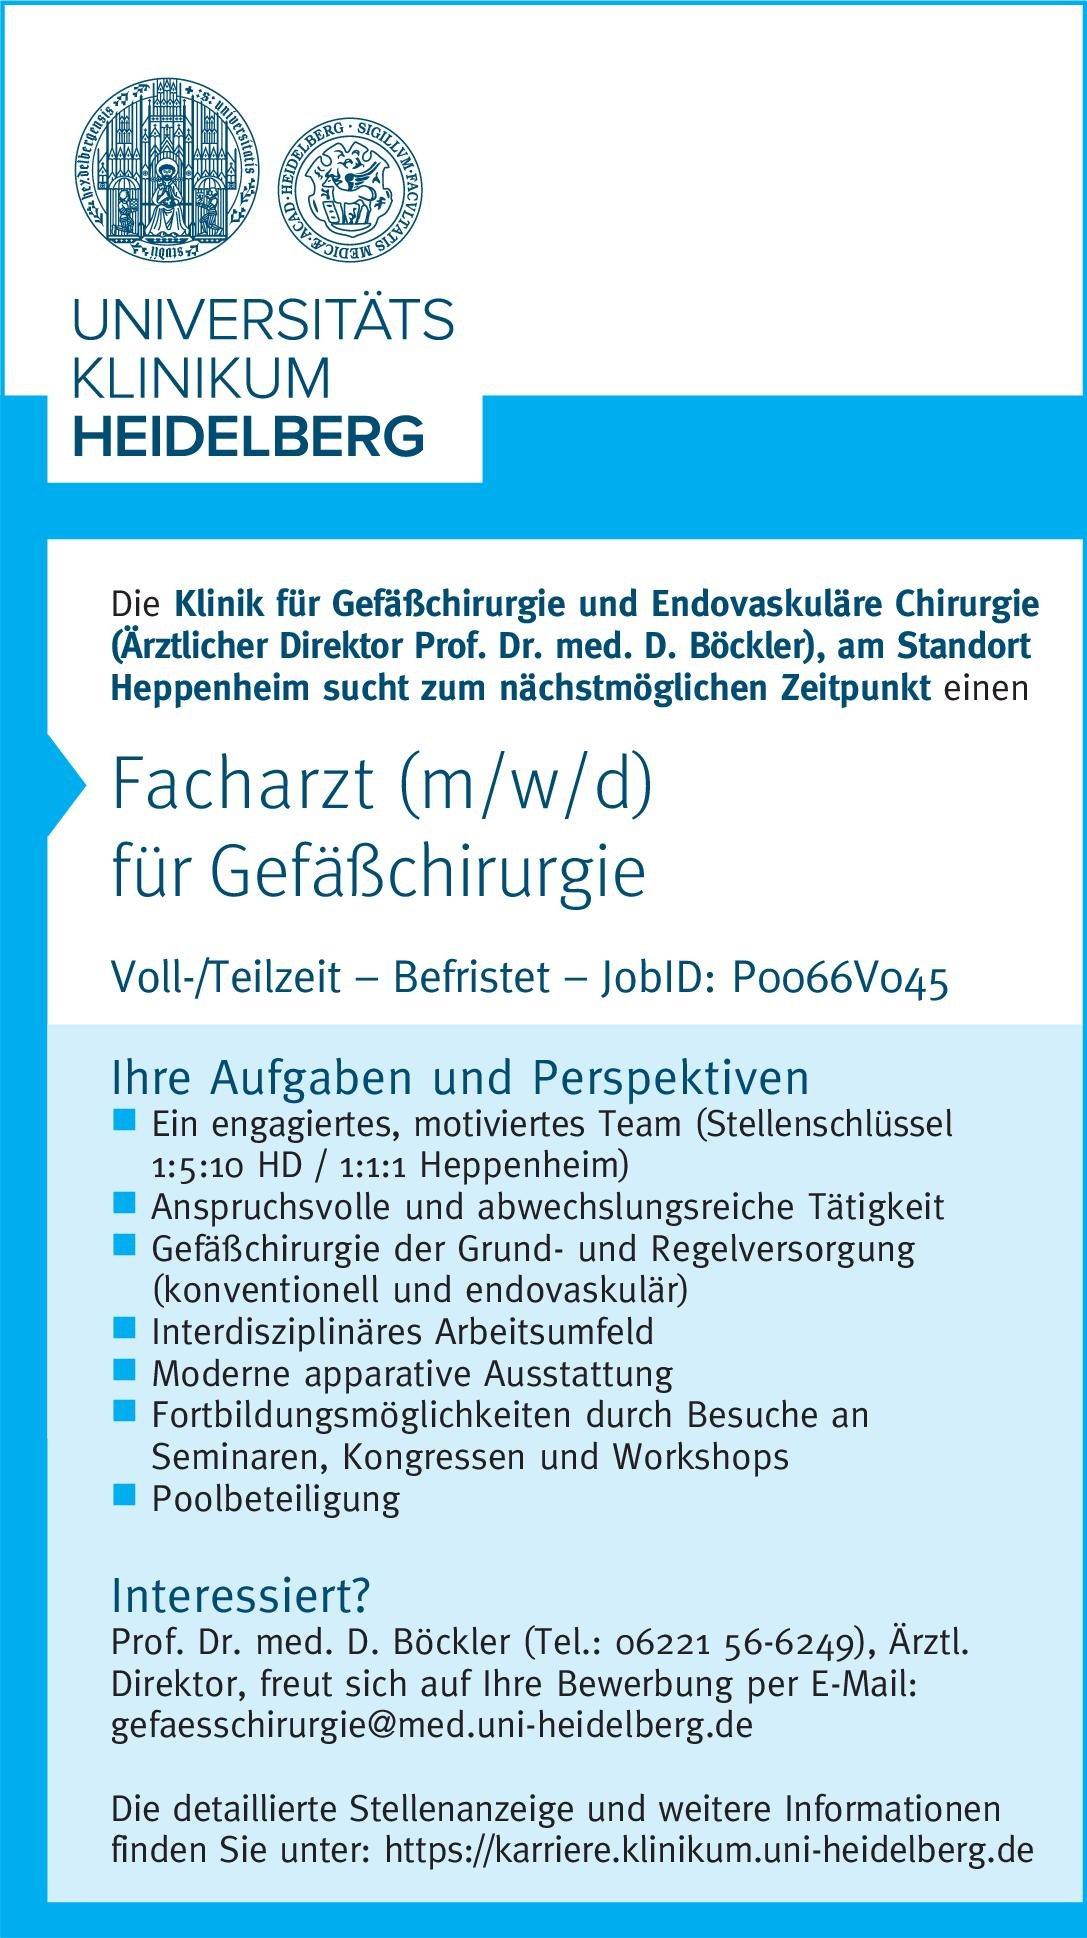 Universitätsklinikum Heidelberg Facharzt (m/w/d) für Gefäßchirurgie  Gefäßchirurgie, Chirurgie Arzt / Facharzt